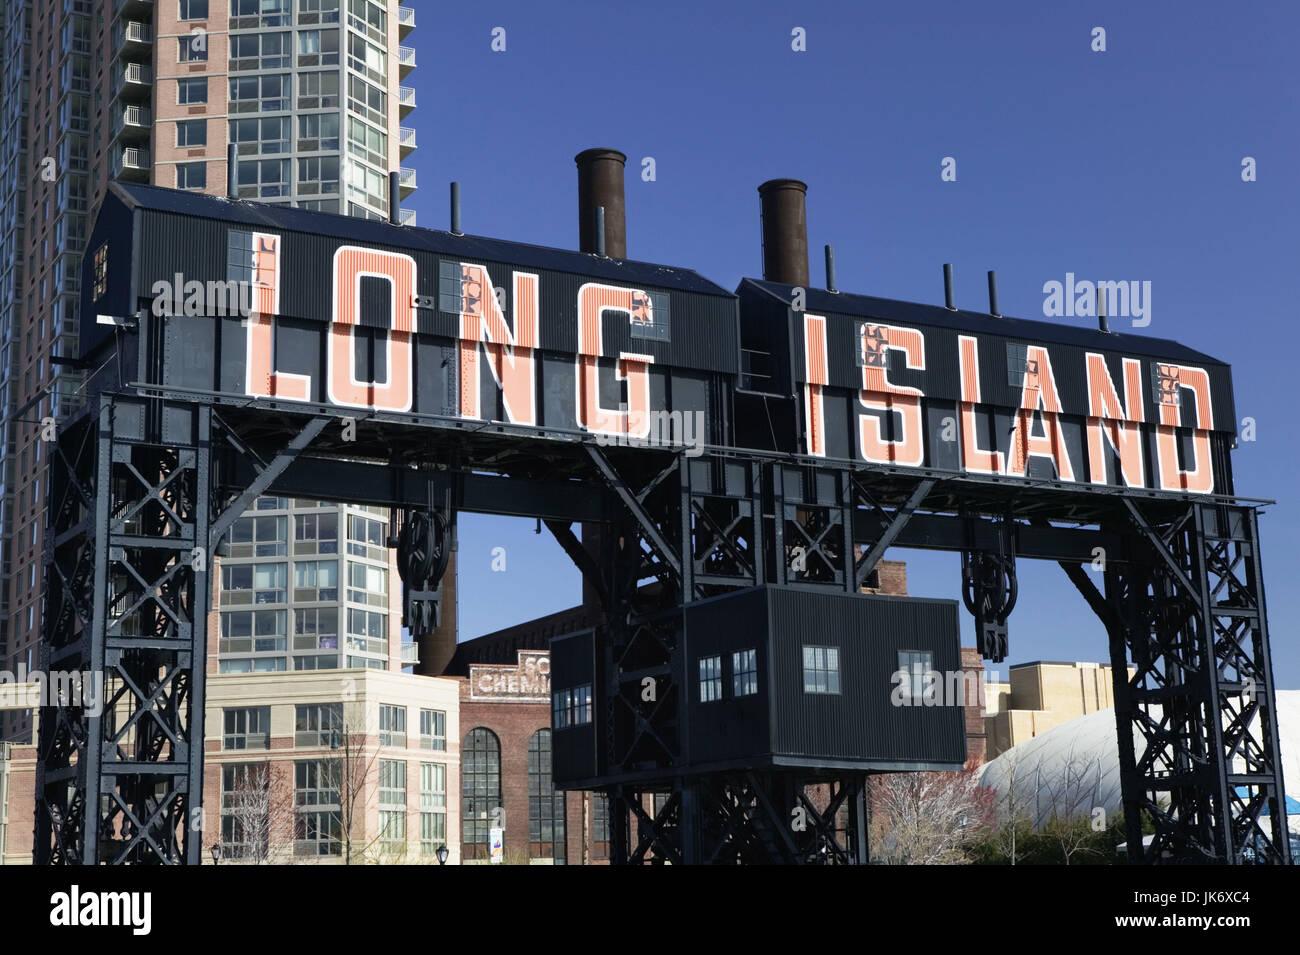 USA, New York City, Queens, Long  Island City, Fährhafen, Landekran, Detail Amerika, Nordamerika, Großstadt, - Stock Image